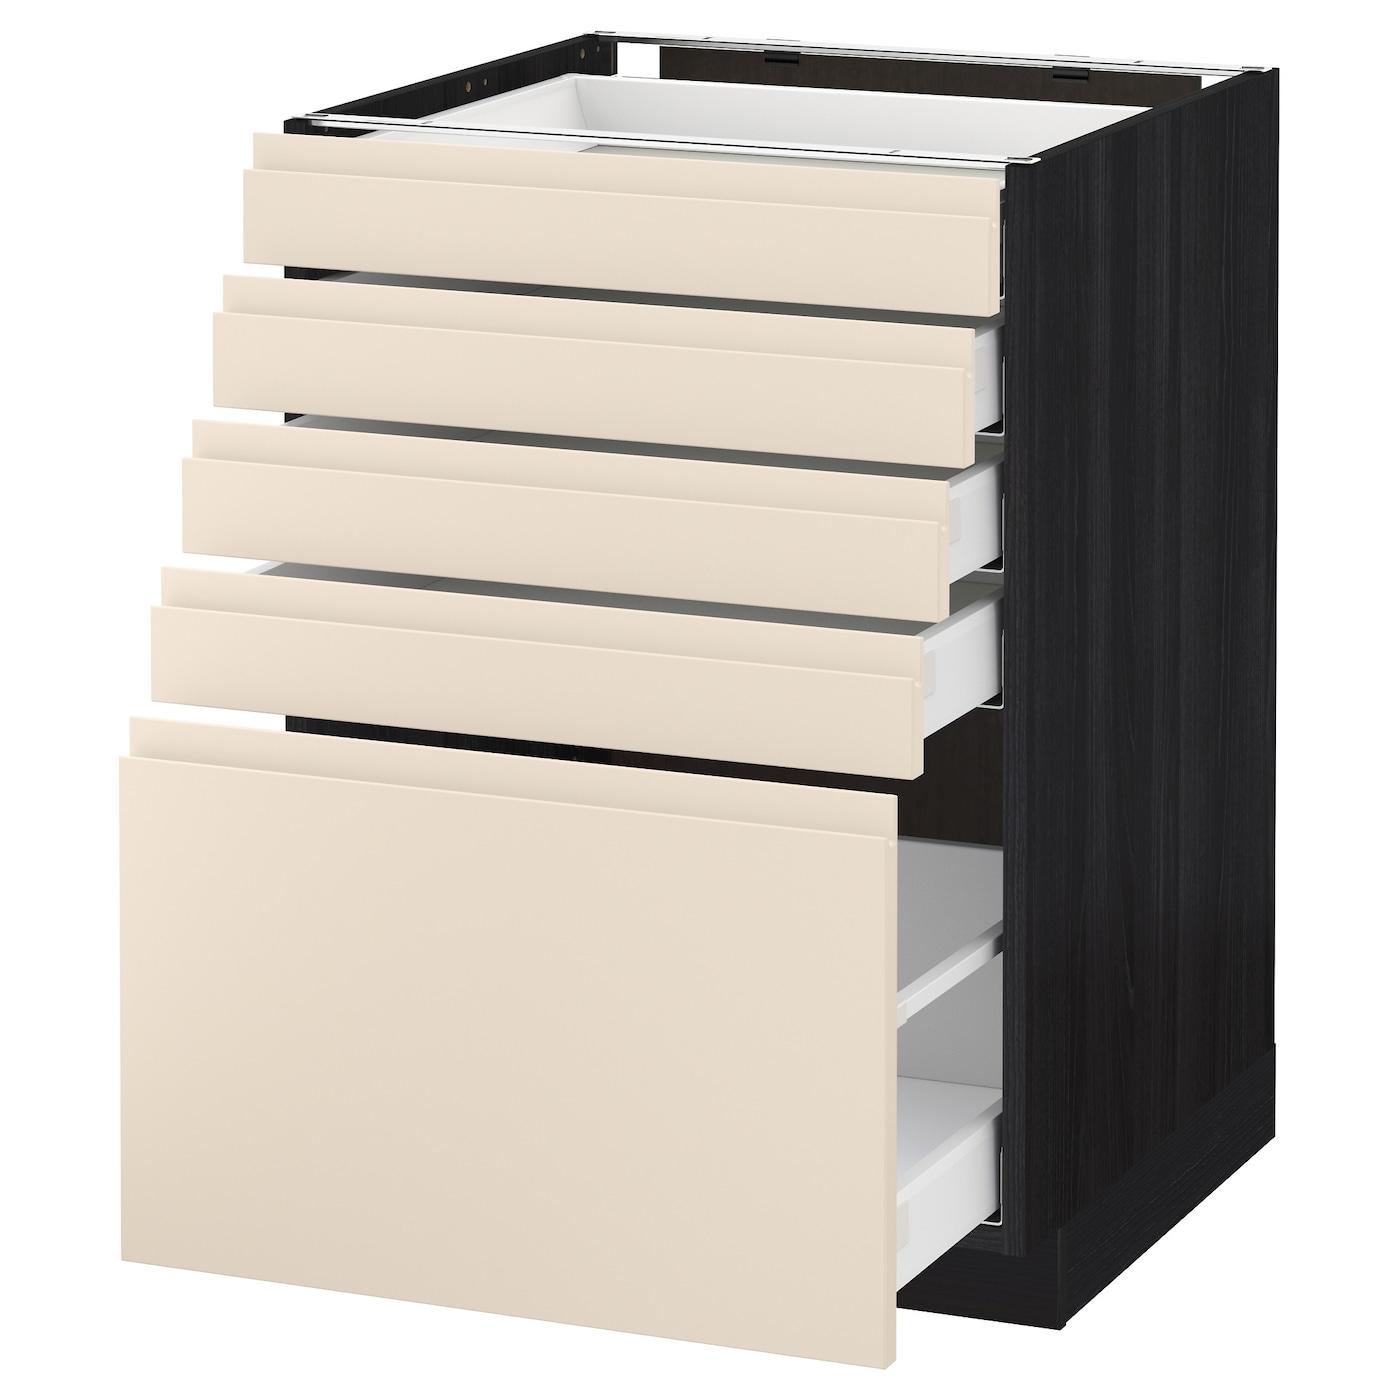 metod maximera base cabinet with 5 drawers black voxtorp light beige 60x60 cm ikea. Black Bedroom Furniture Sets. Home Design Ideas